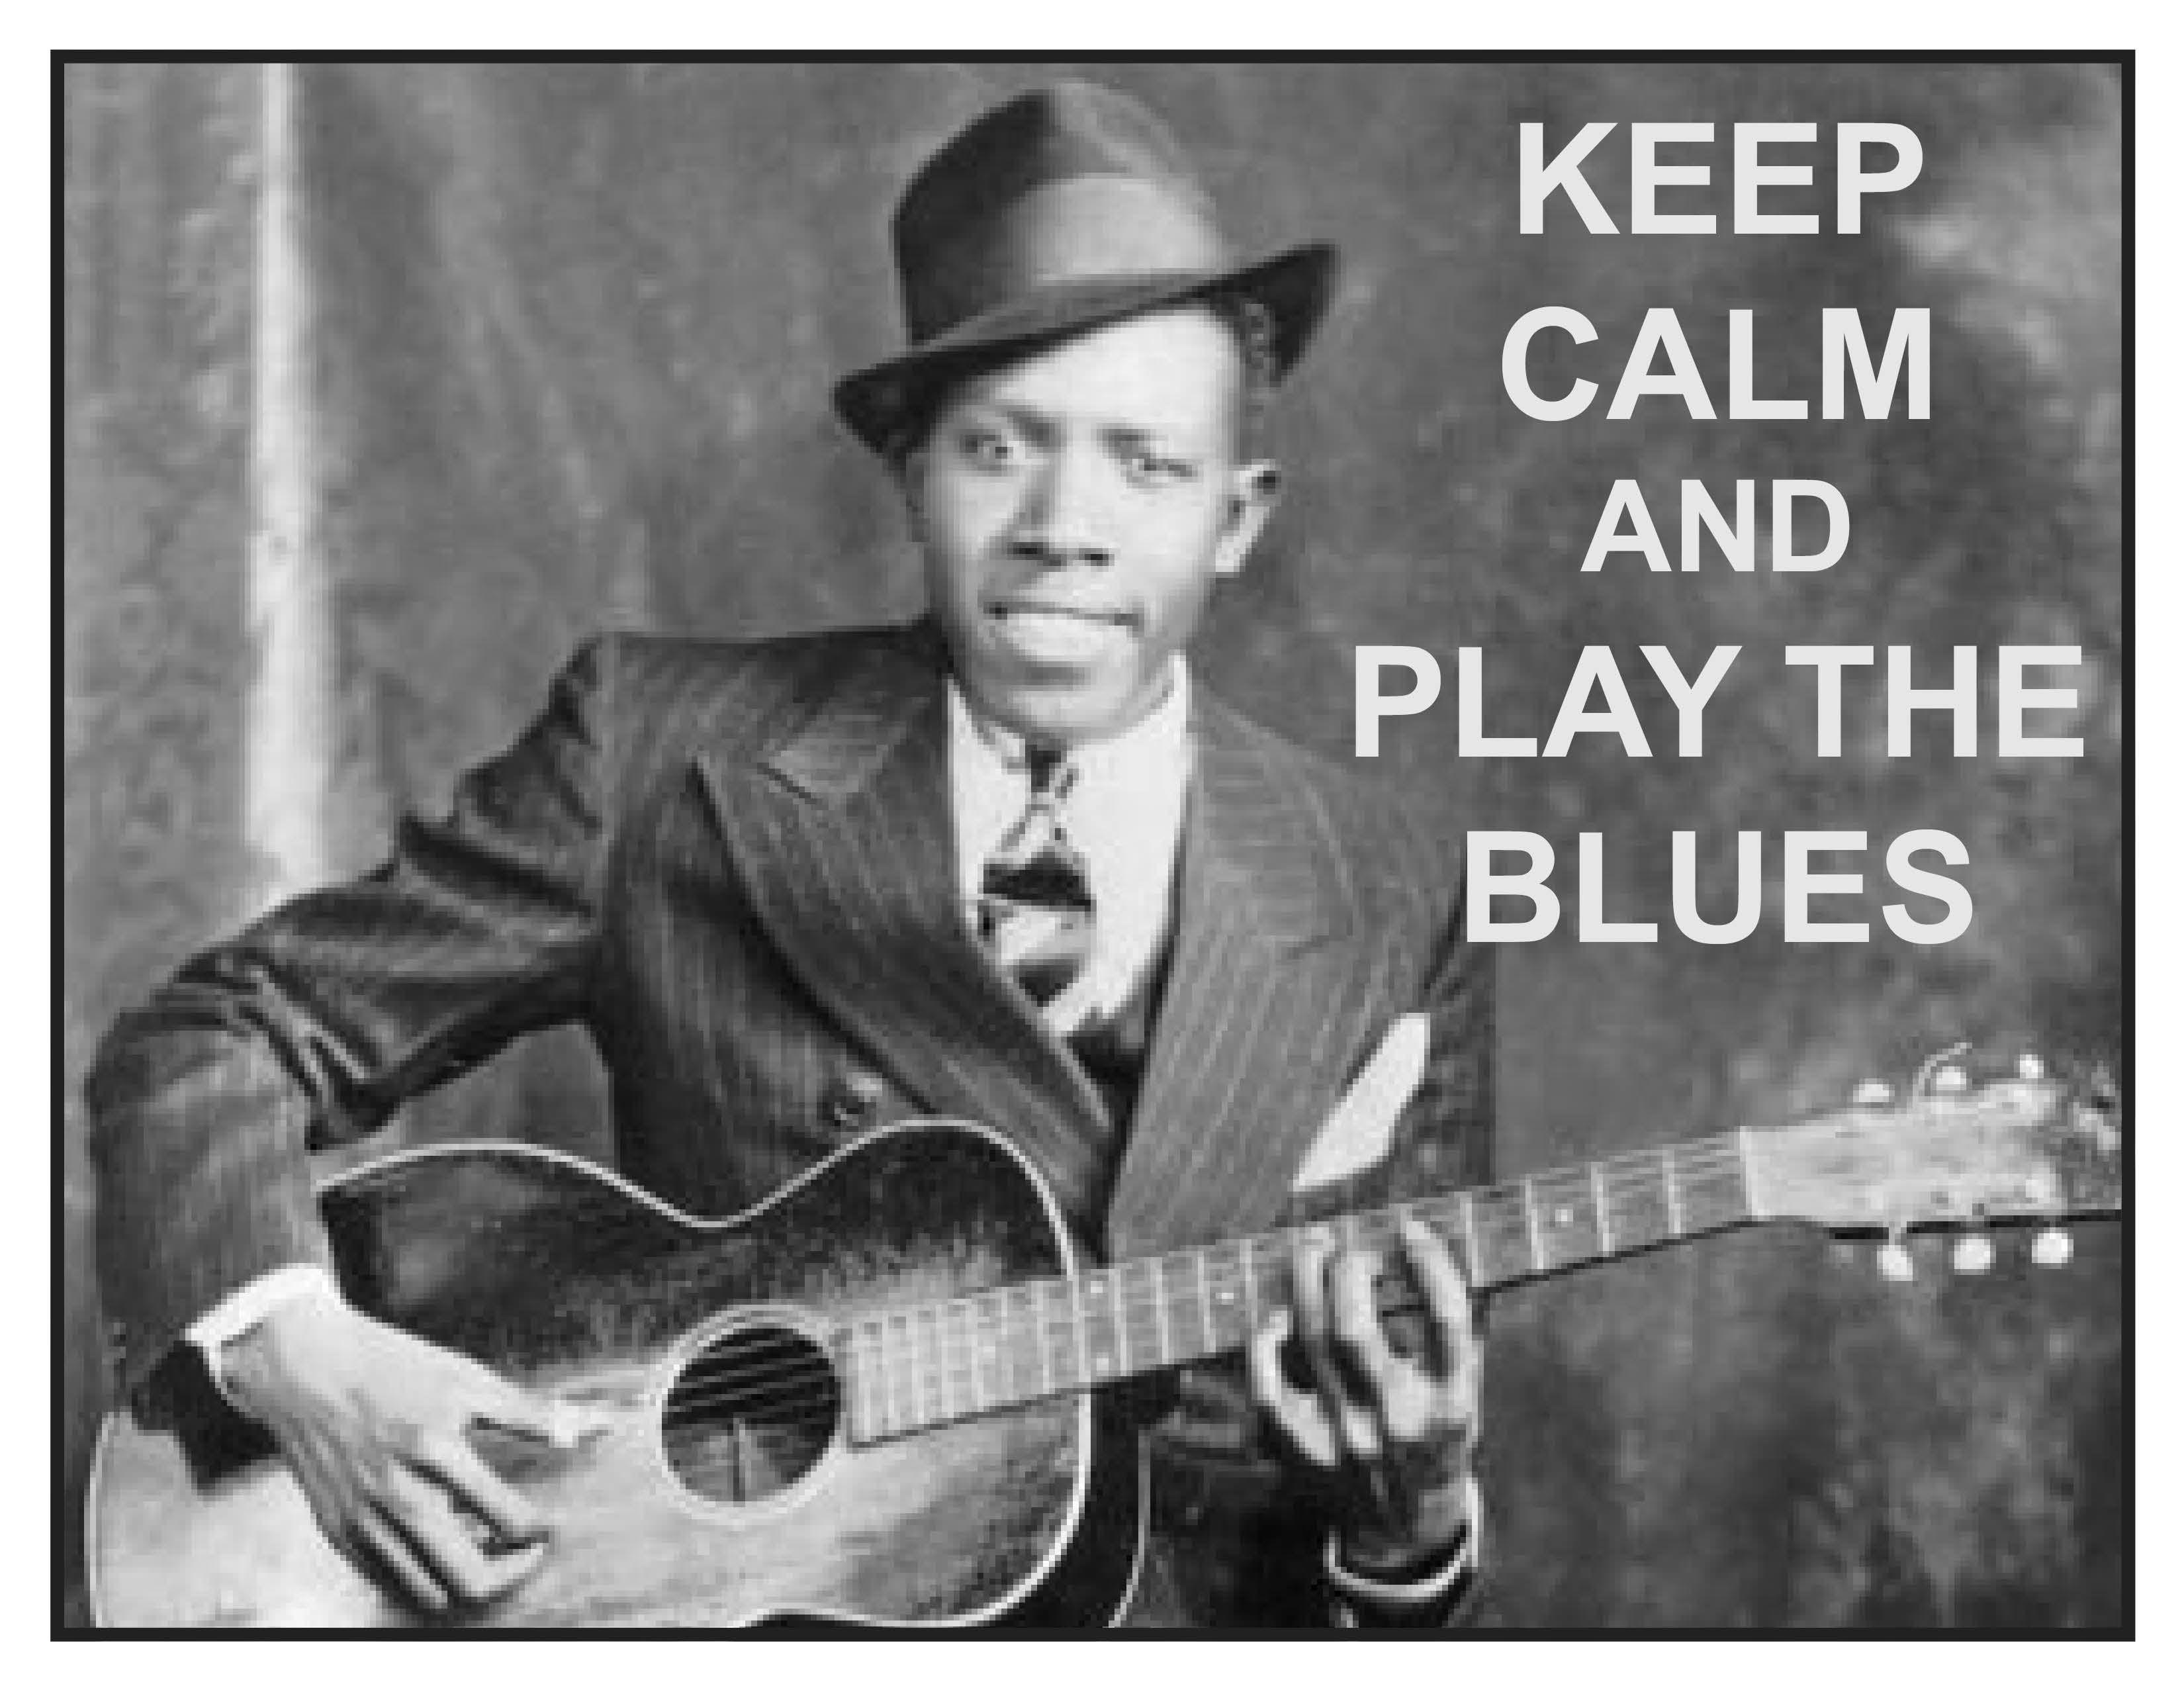 Keep Calm and Play the Blues - Robert Johnson